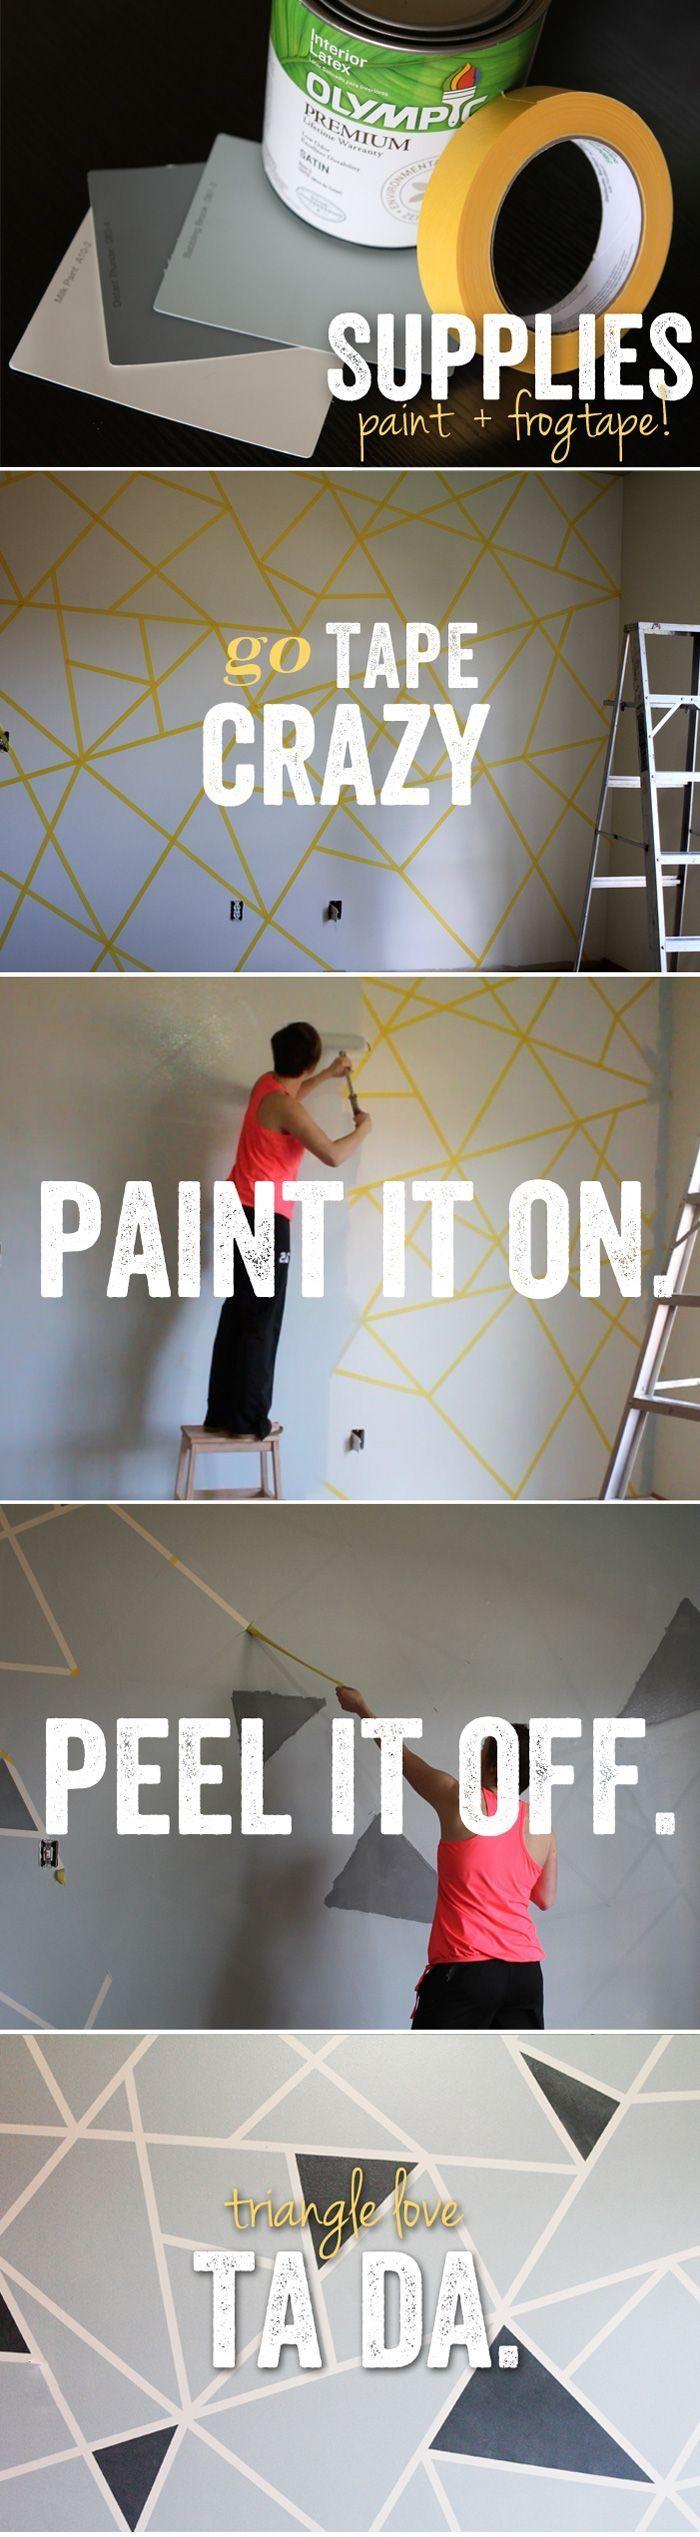 Best 25+ Unique Wall Art Ideas Only On Pinterest | Plaster Art For Kaleidoscope Wall Art (Image 8 of 20)